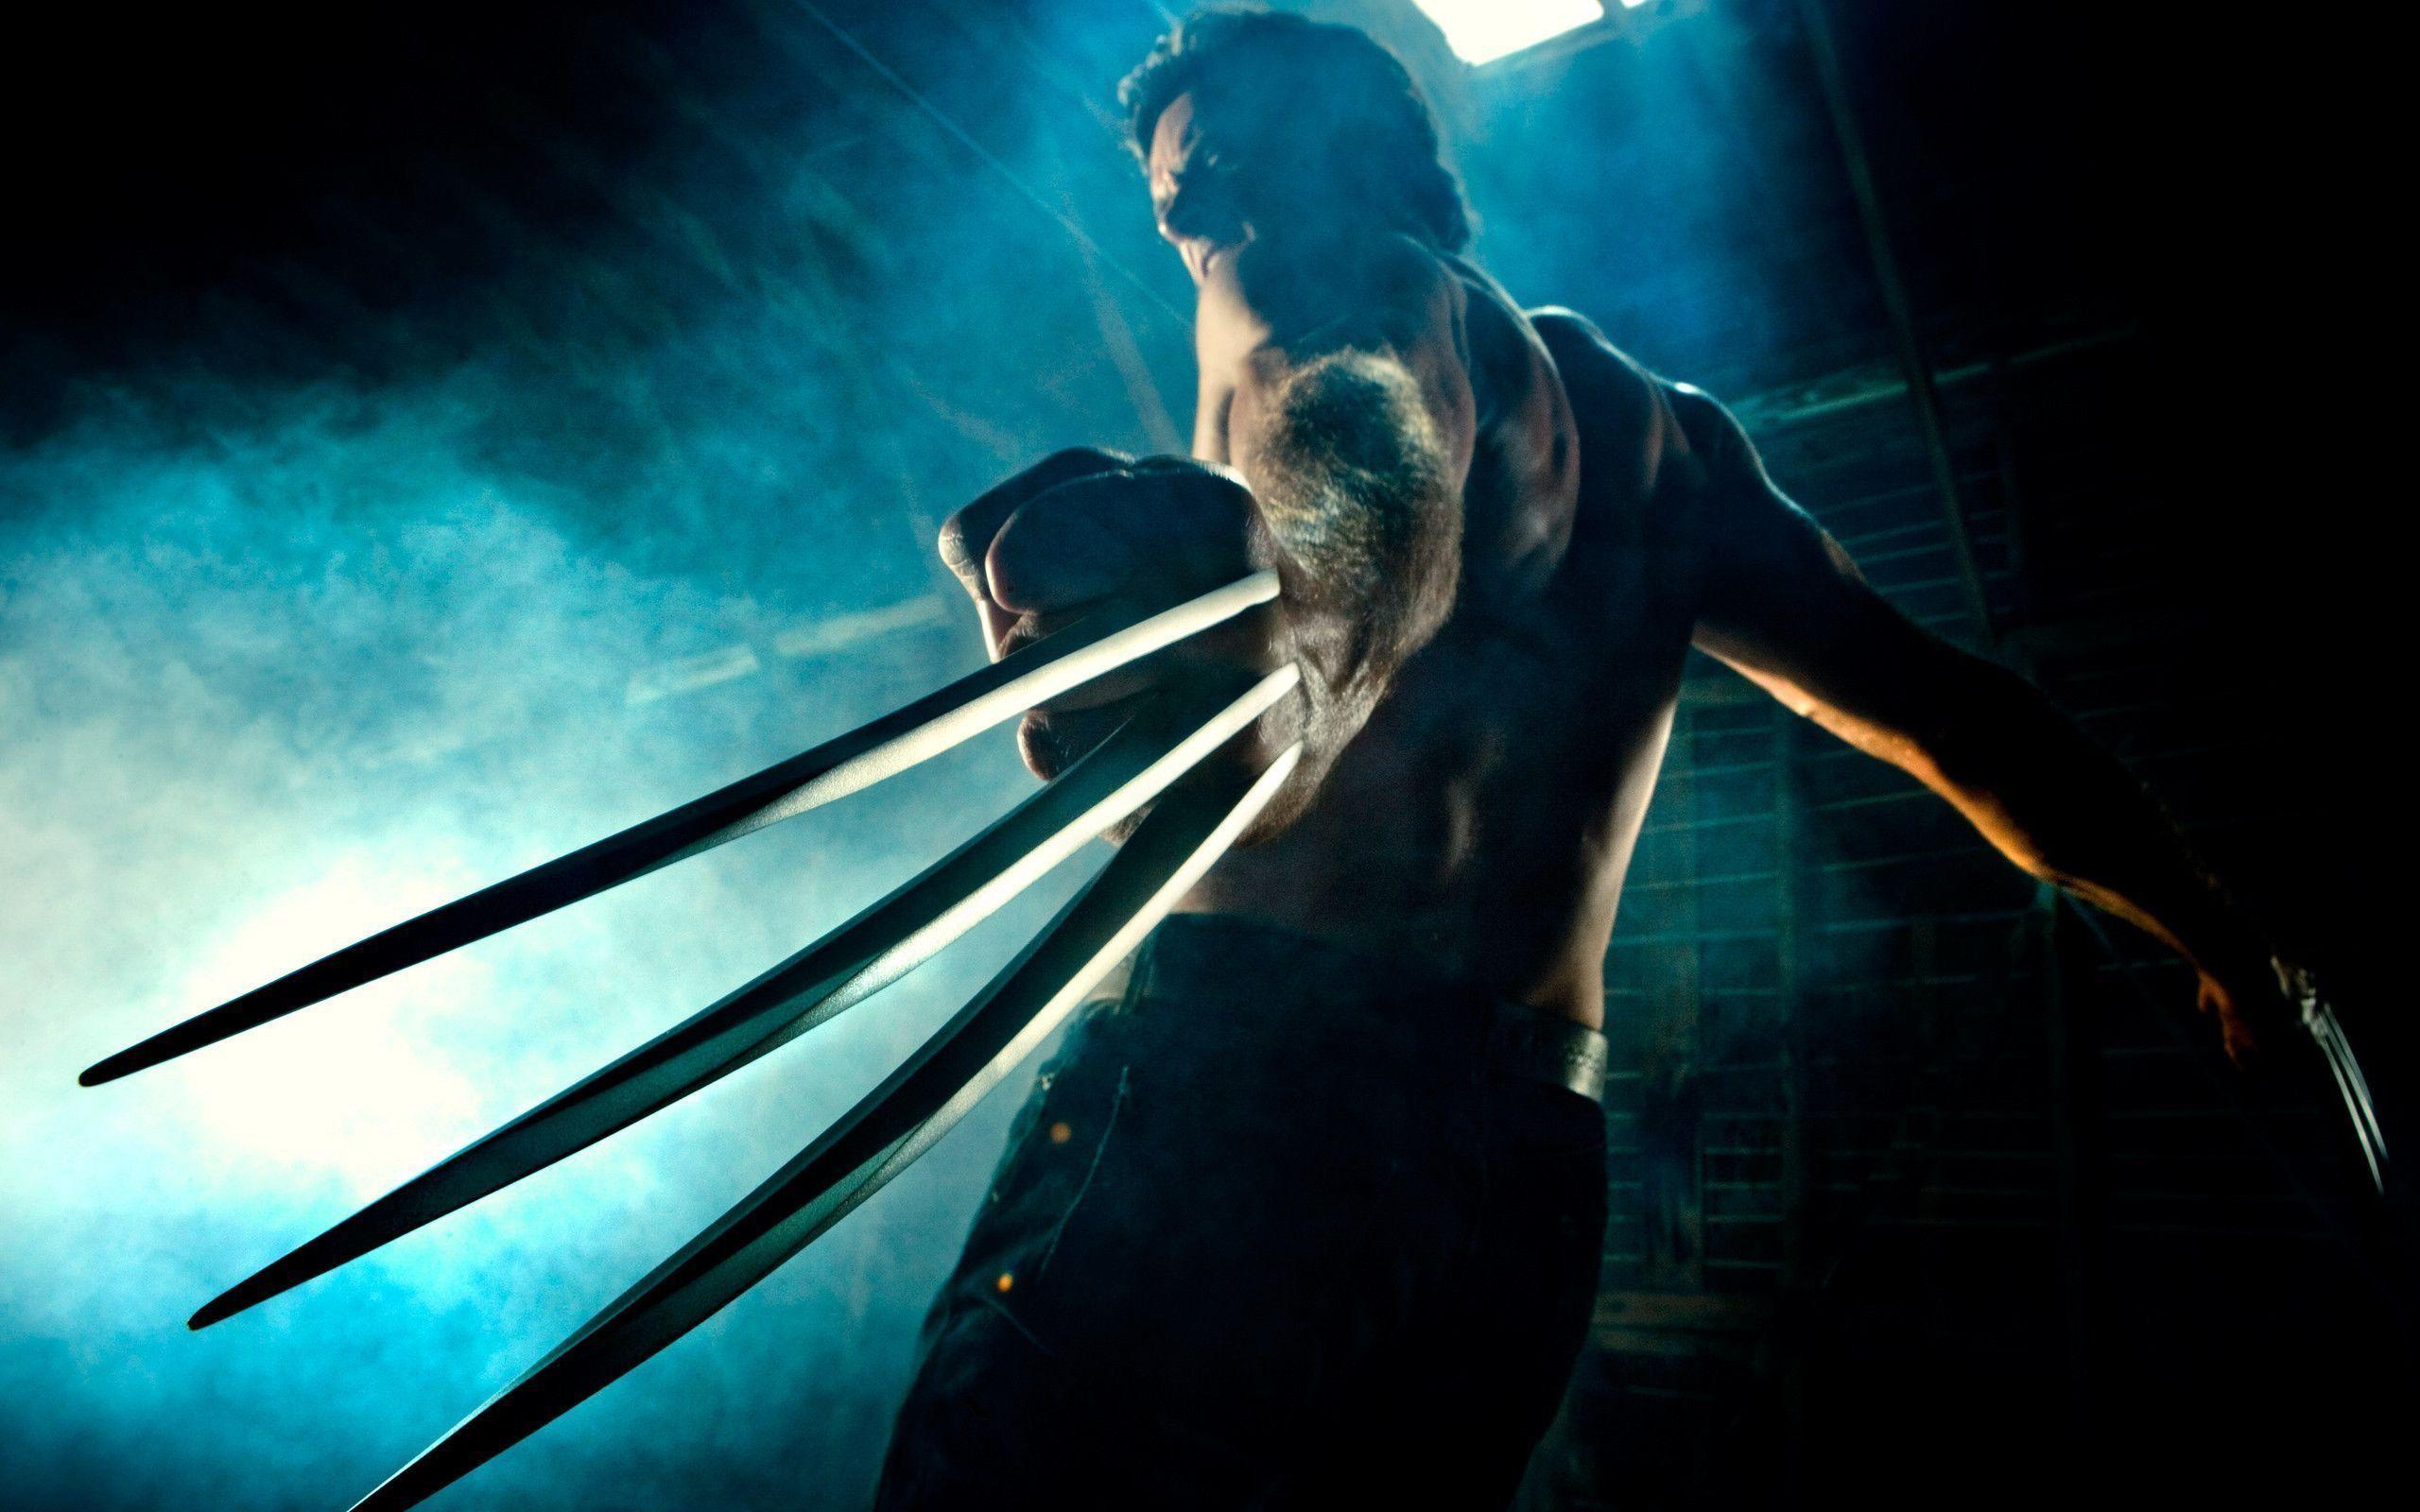 Most Downloaded X Men Wallpapers – Full HD wallpaper search